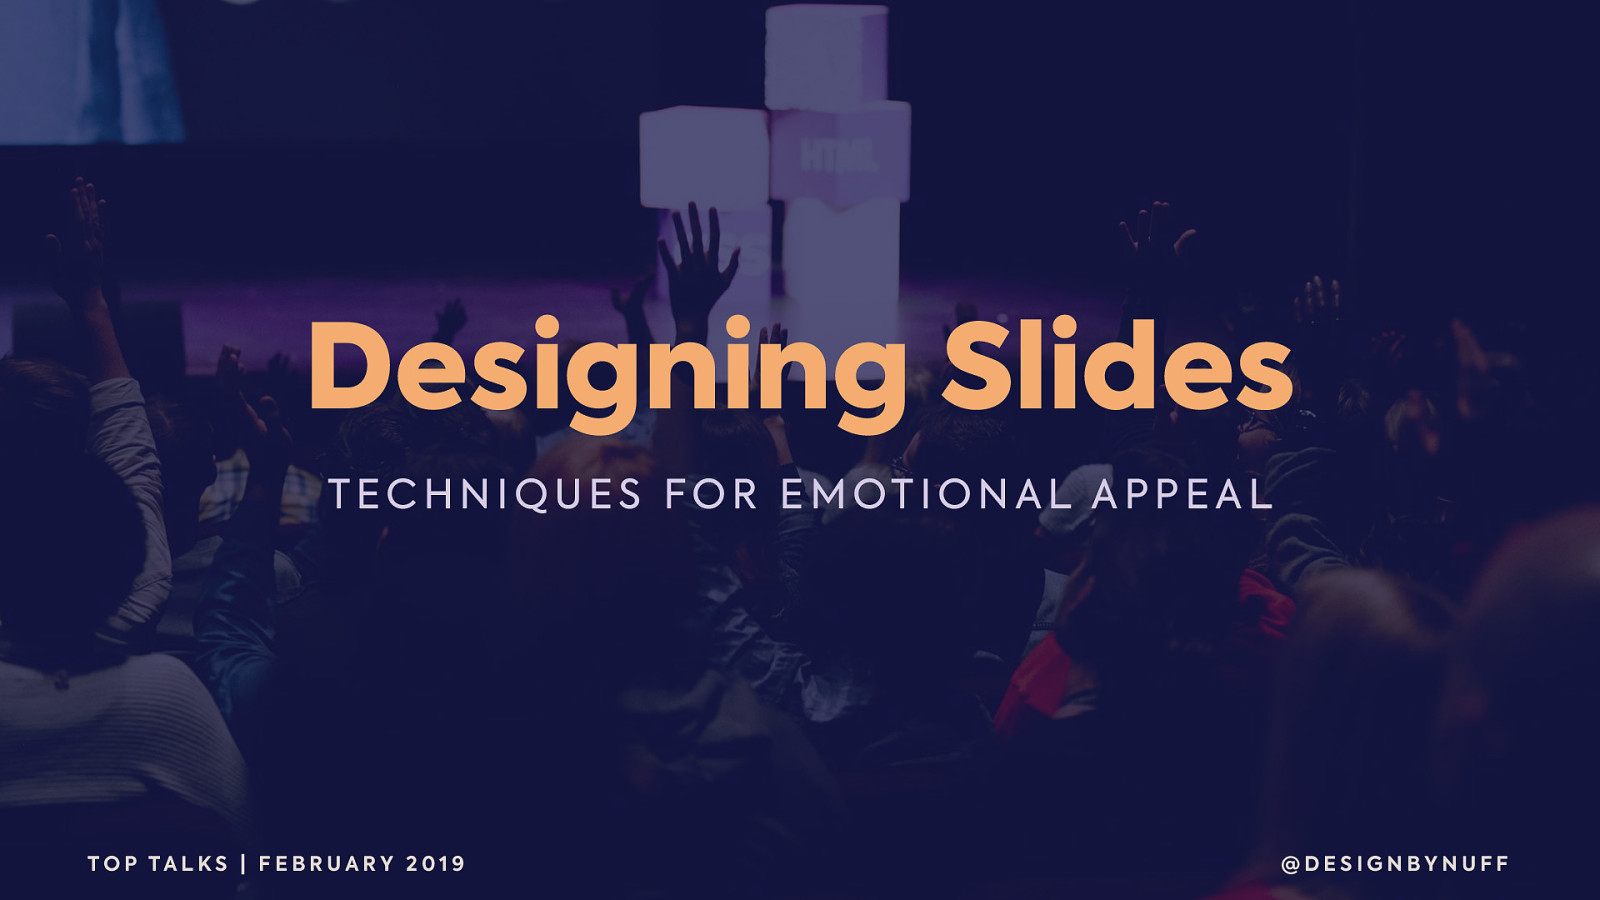 Designing Slides: Techniques for Emotional Appeal